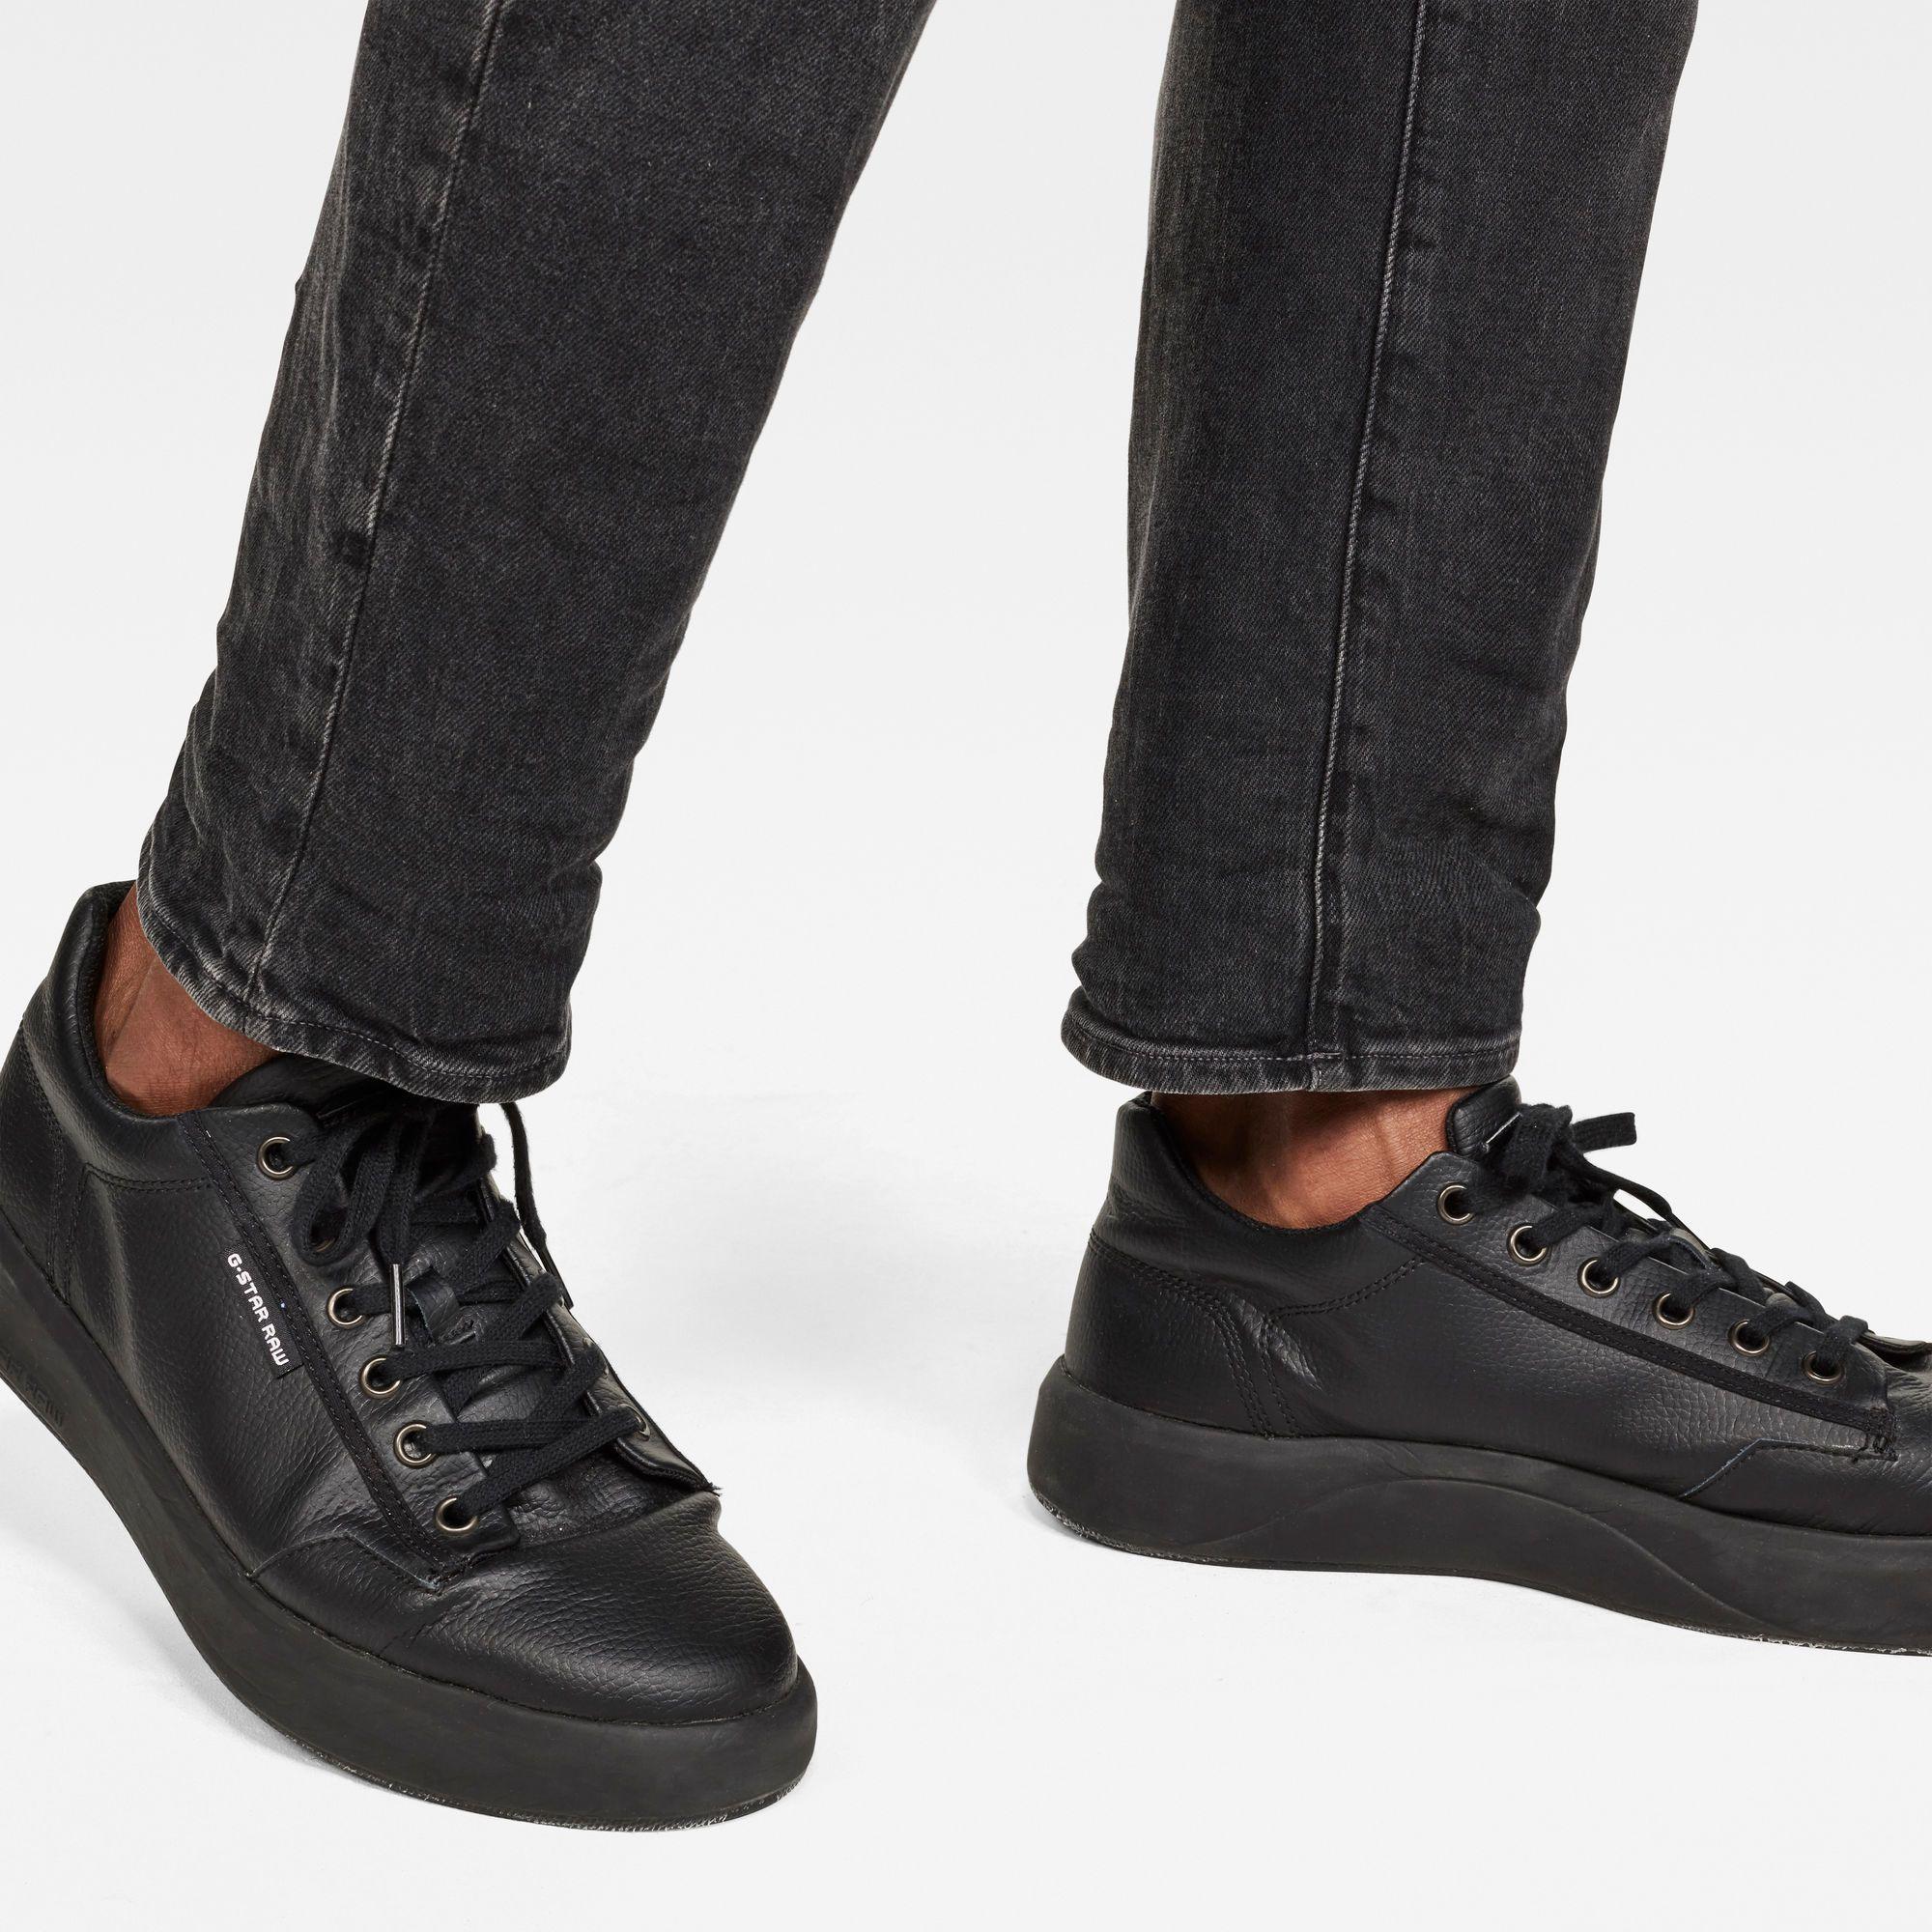 G-Star RAW Kilcot Straight Tapered Jeans